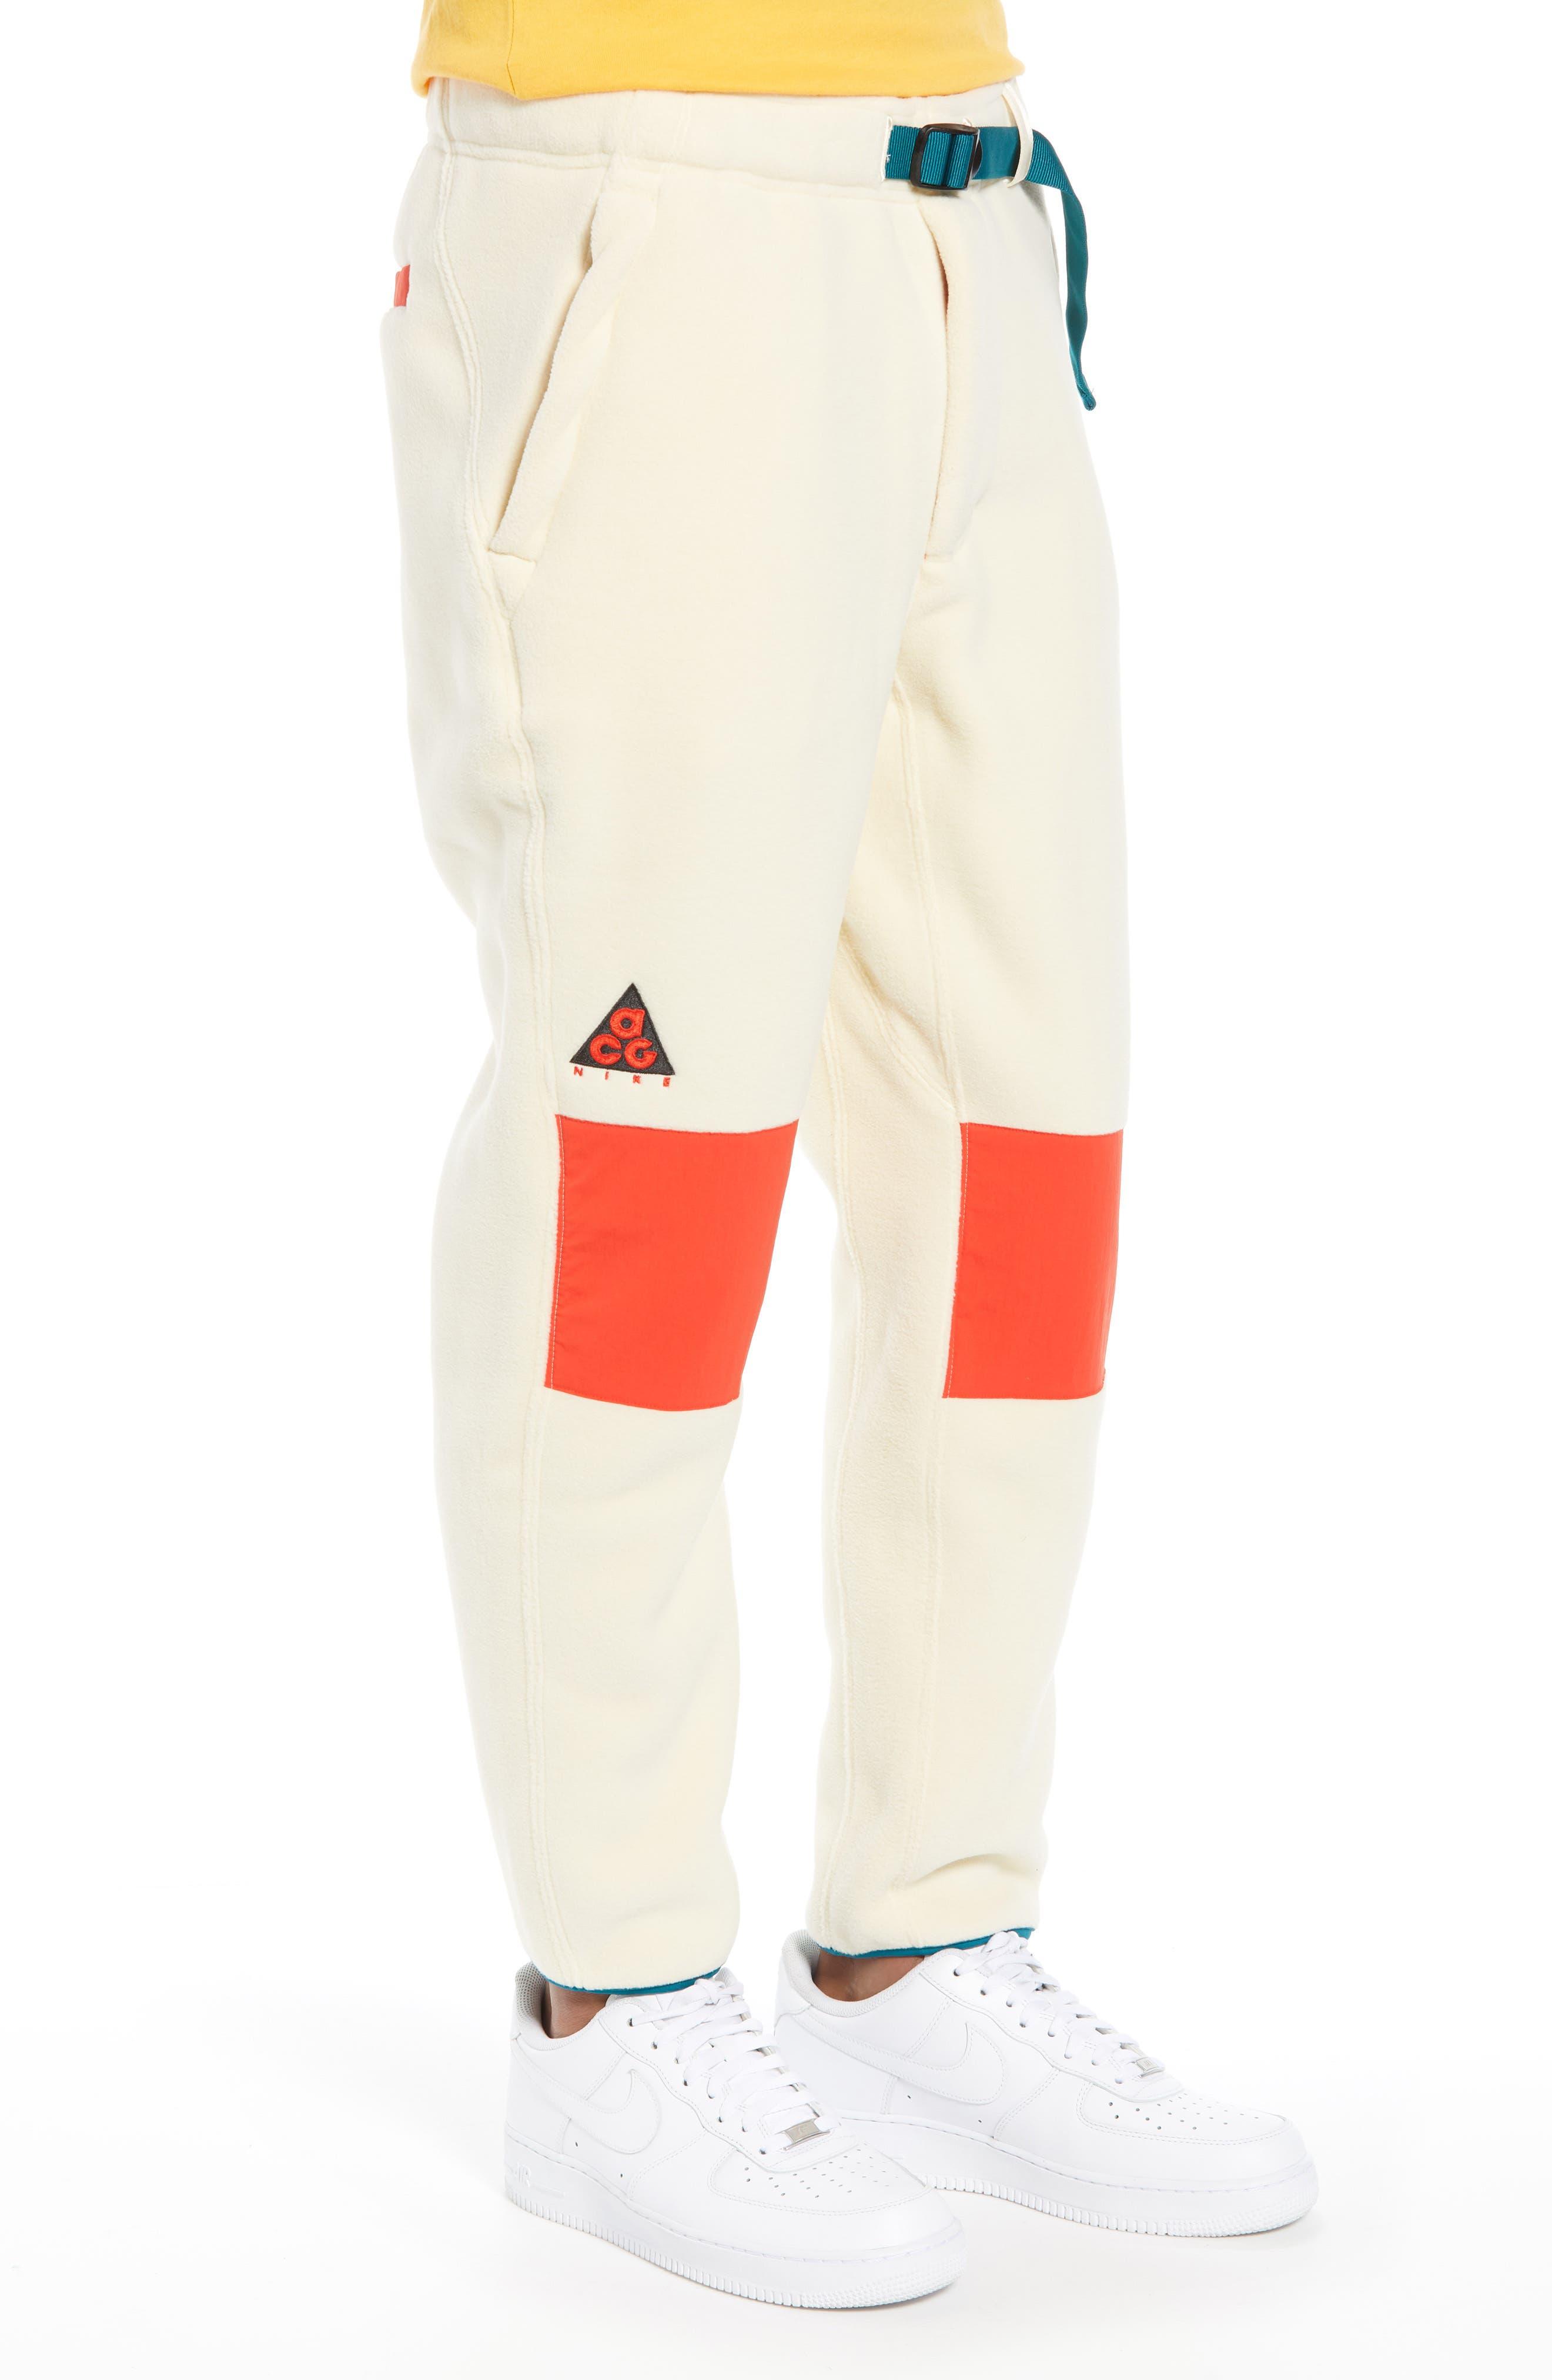 ACG Men's Fleece Pants,                             Alternate thumbnail 3, color,                             LIGHT CREAM